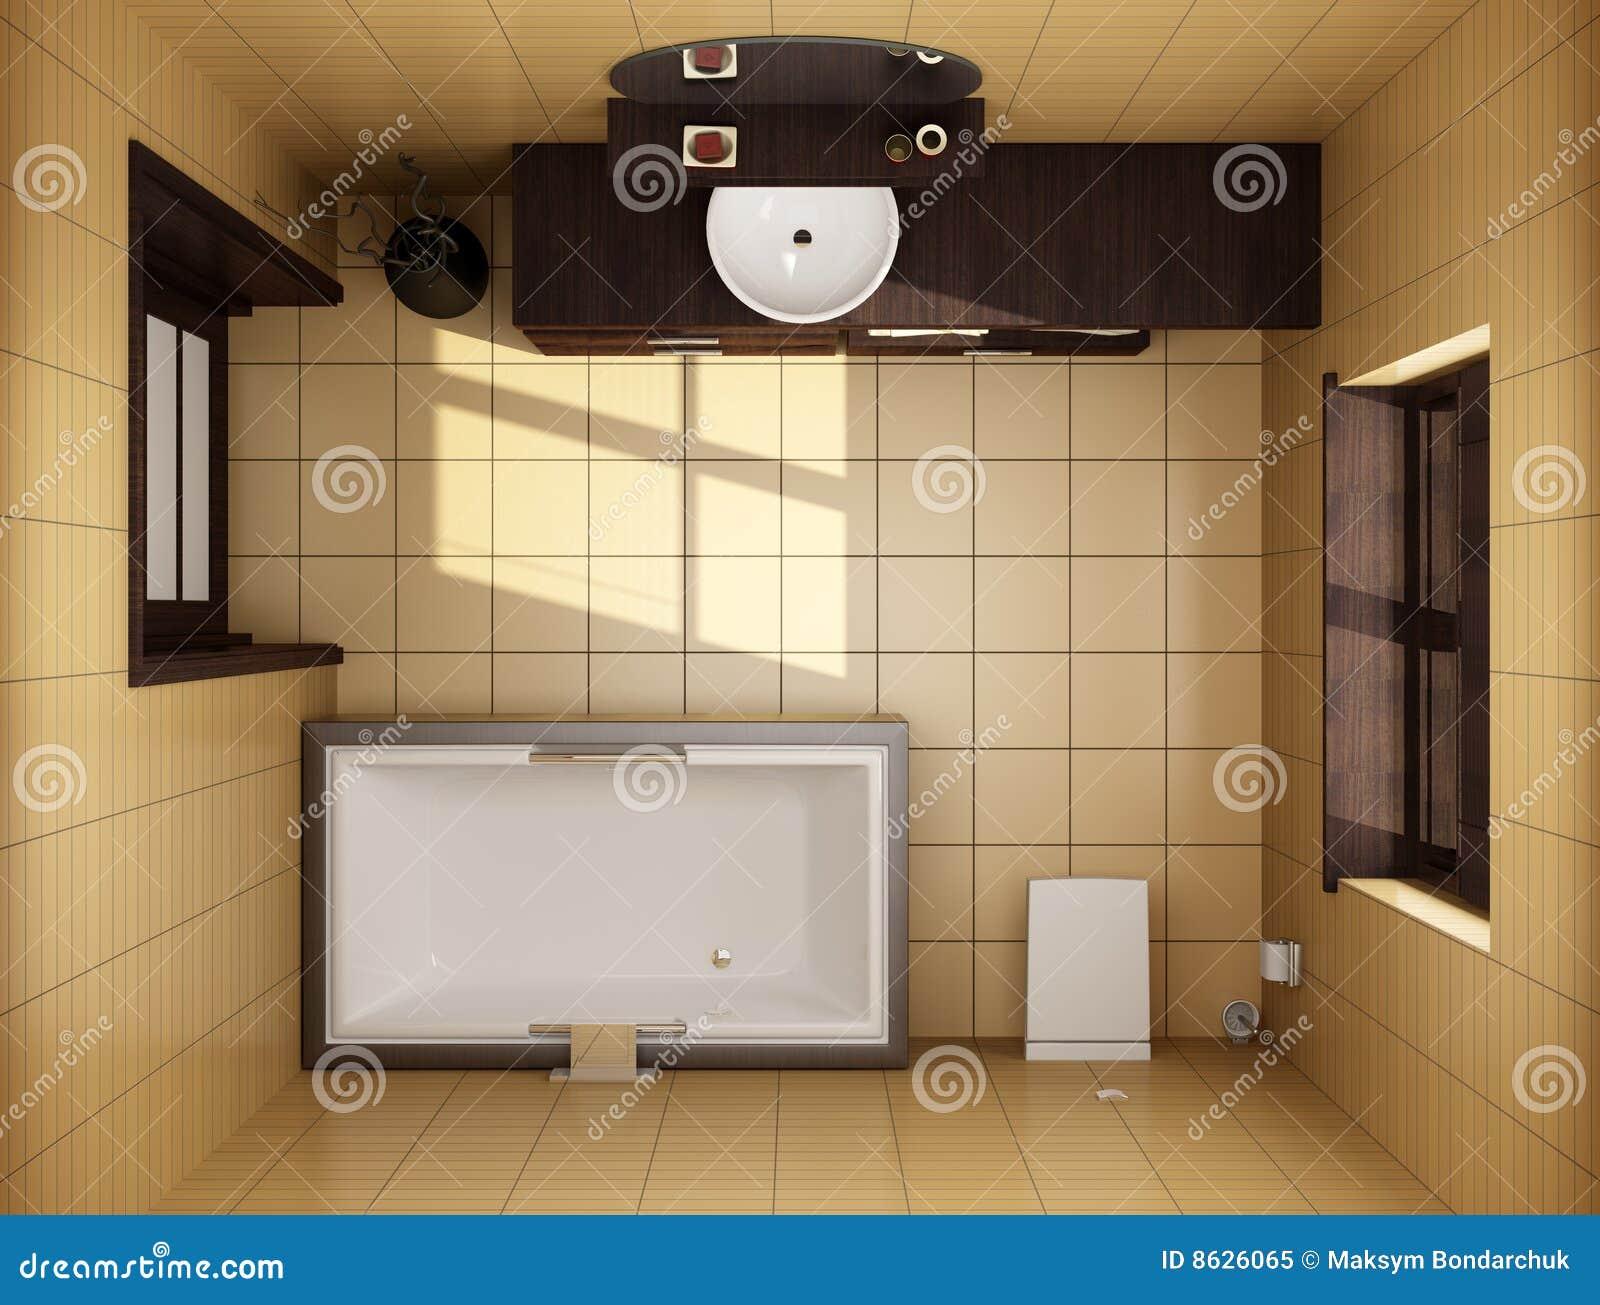 Badezimmer der japanischen art draufsicht stockbild for Badezimmer japanisch